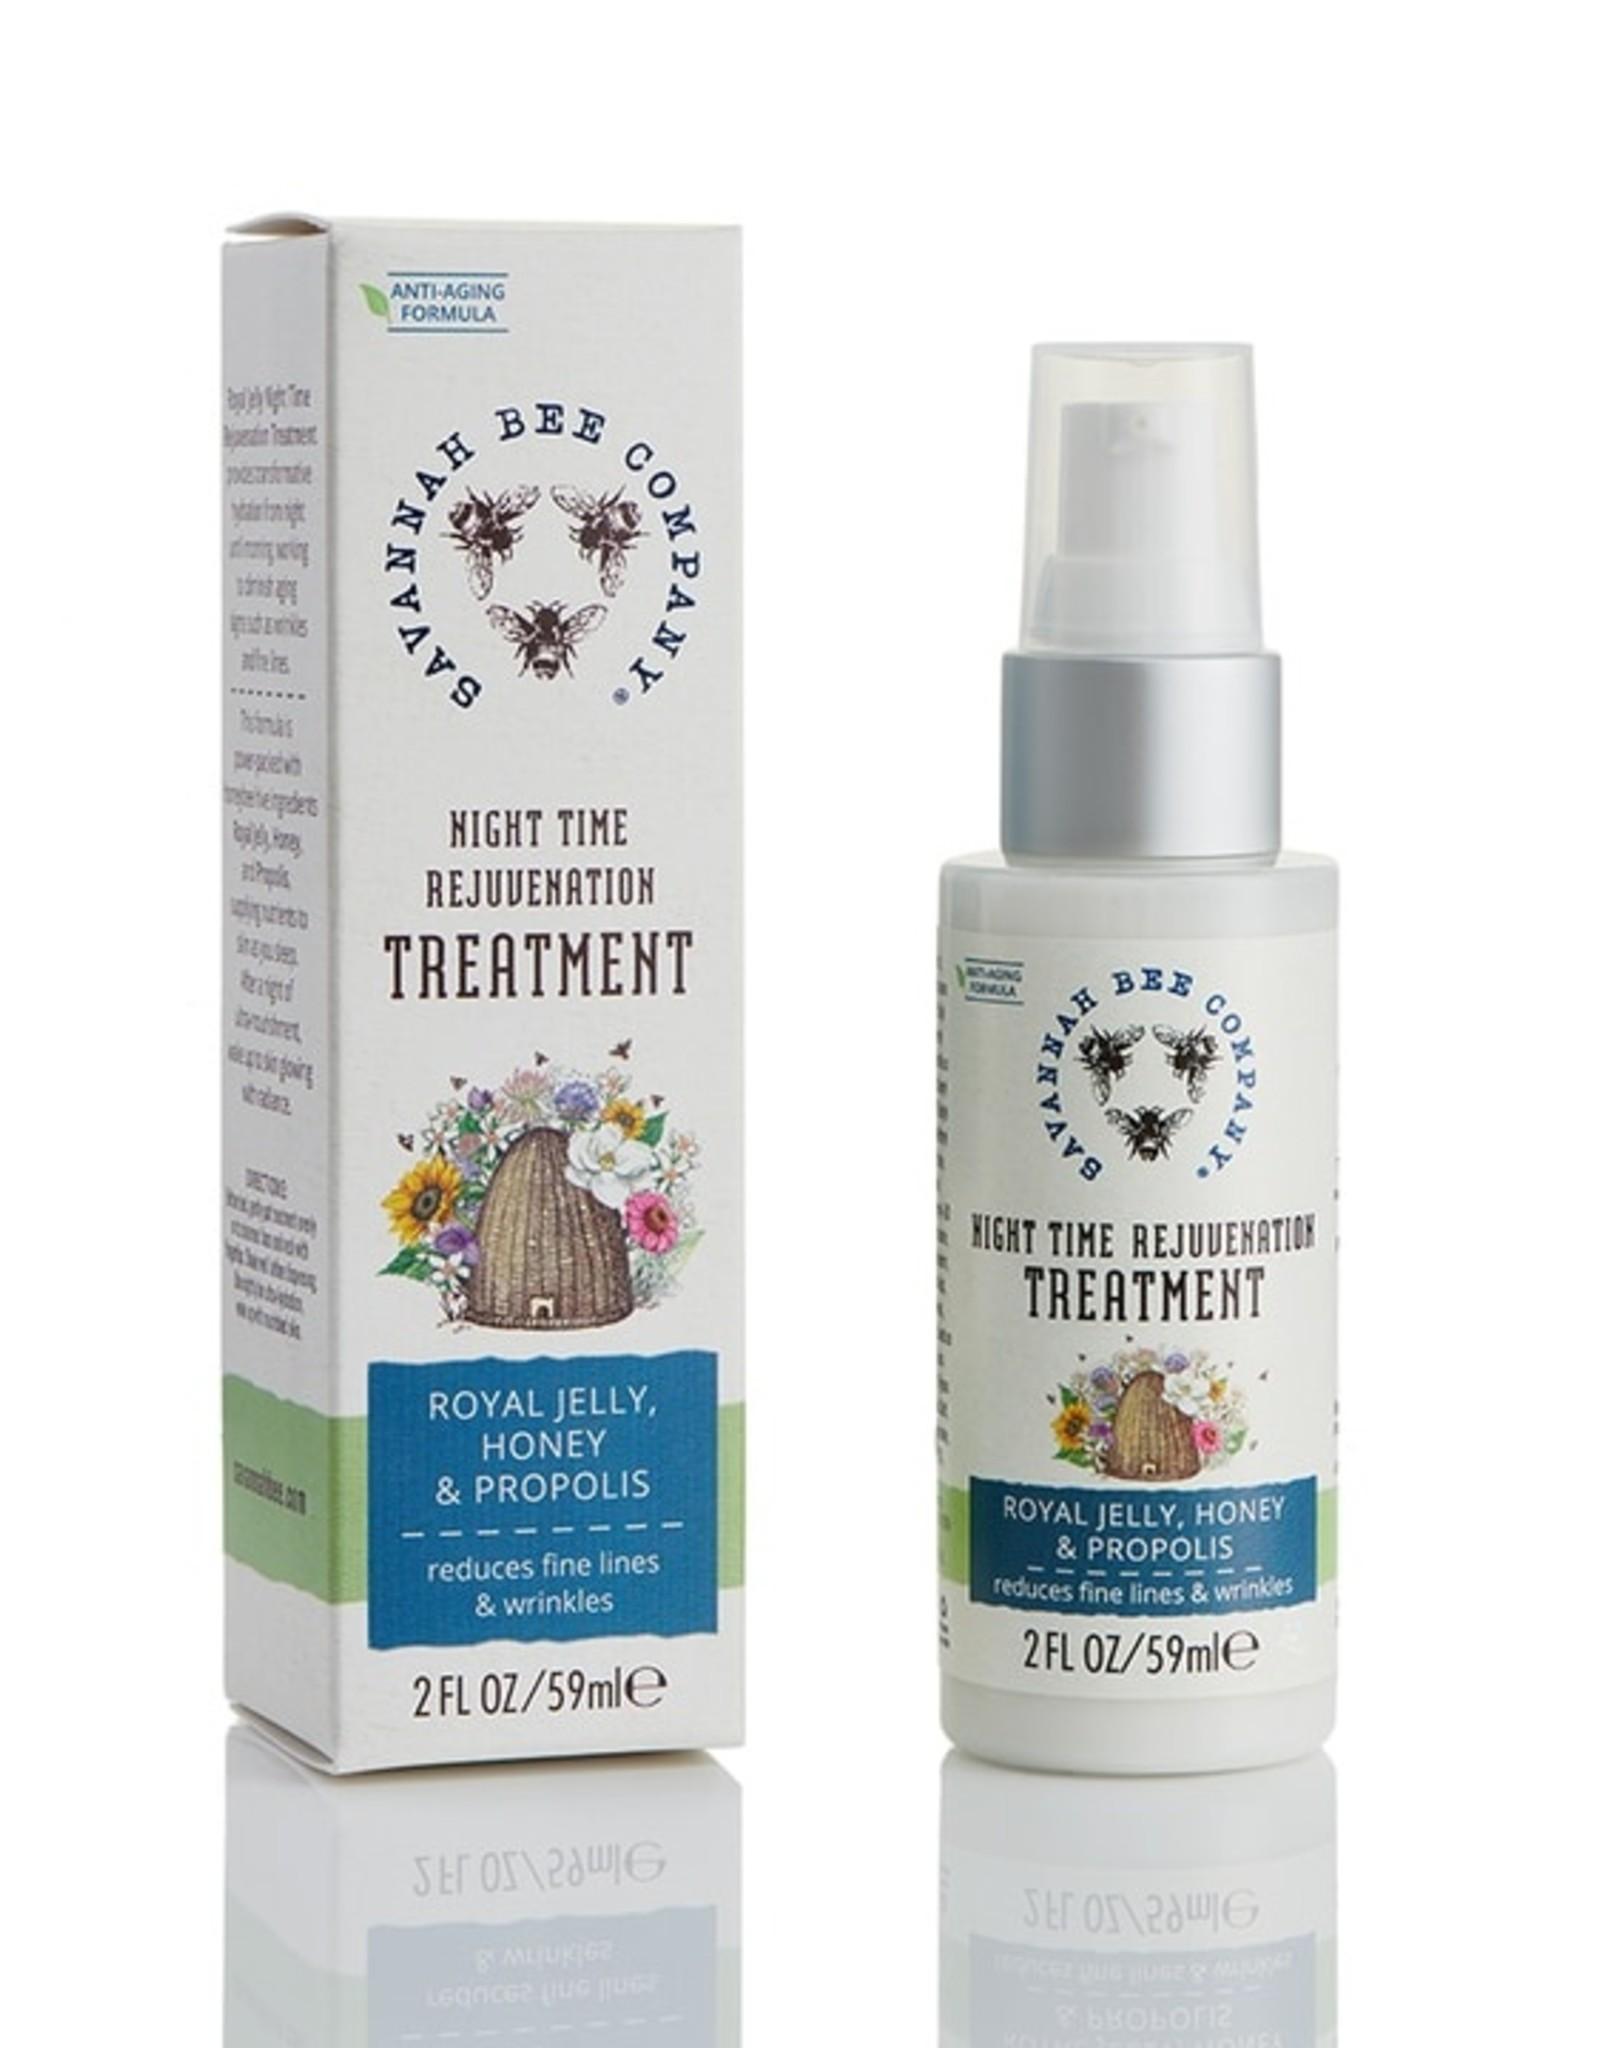 Savannah Bee Company Night Time Rejuvenation Treatment